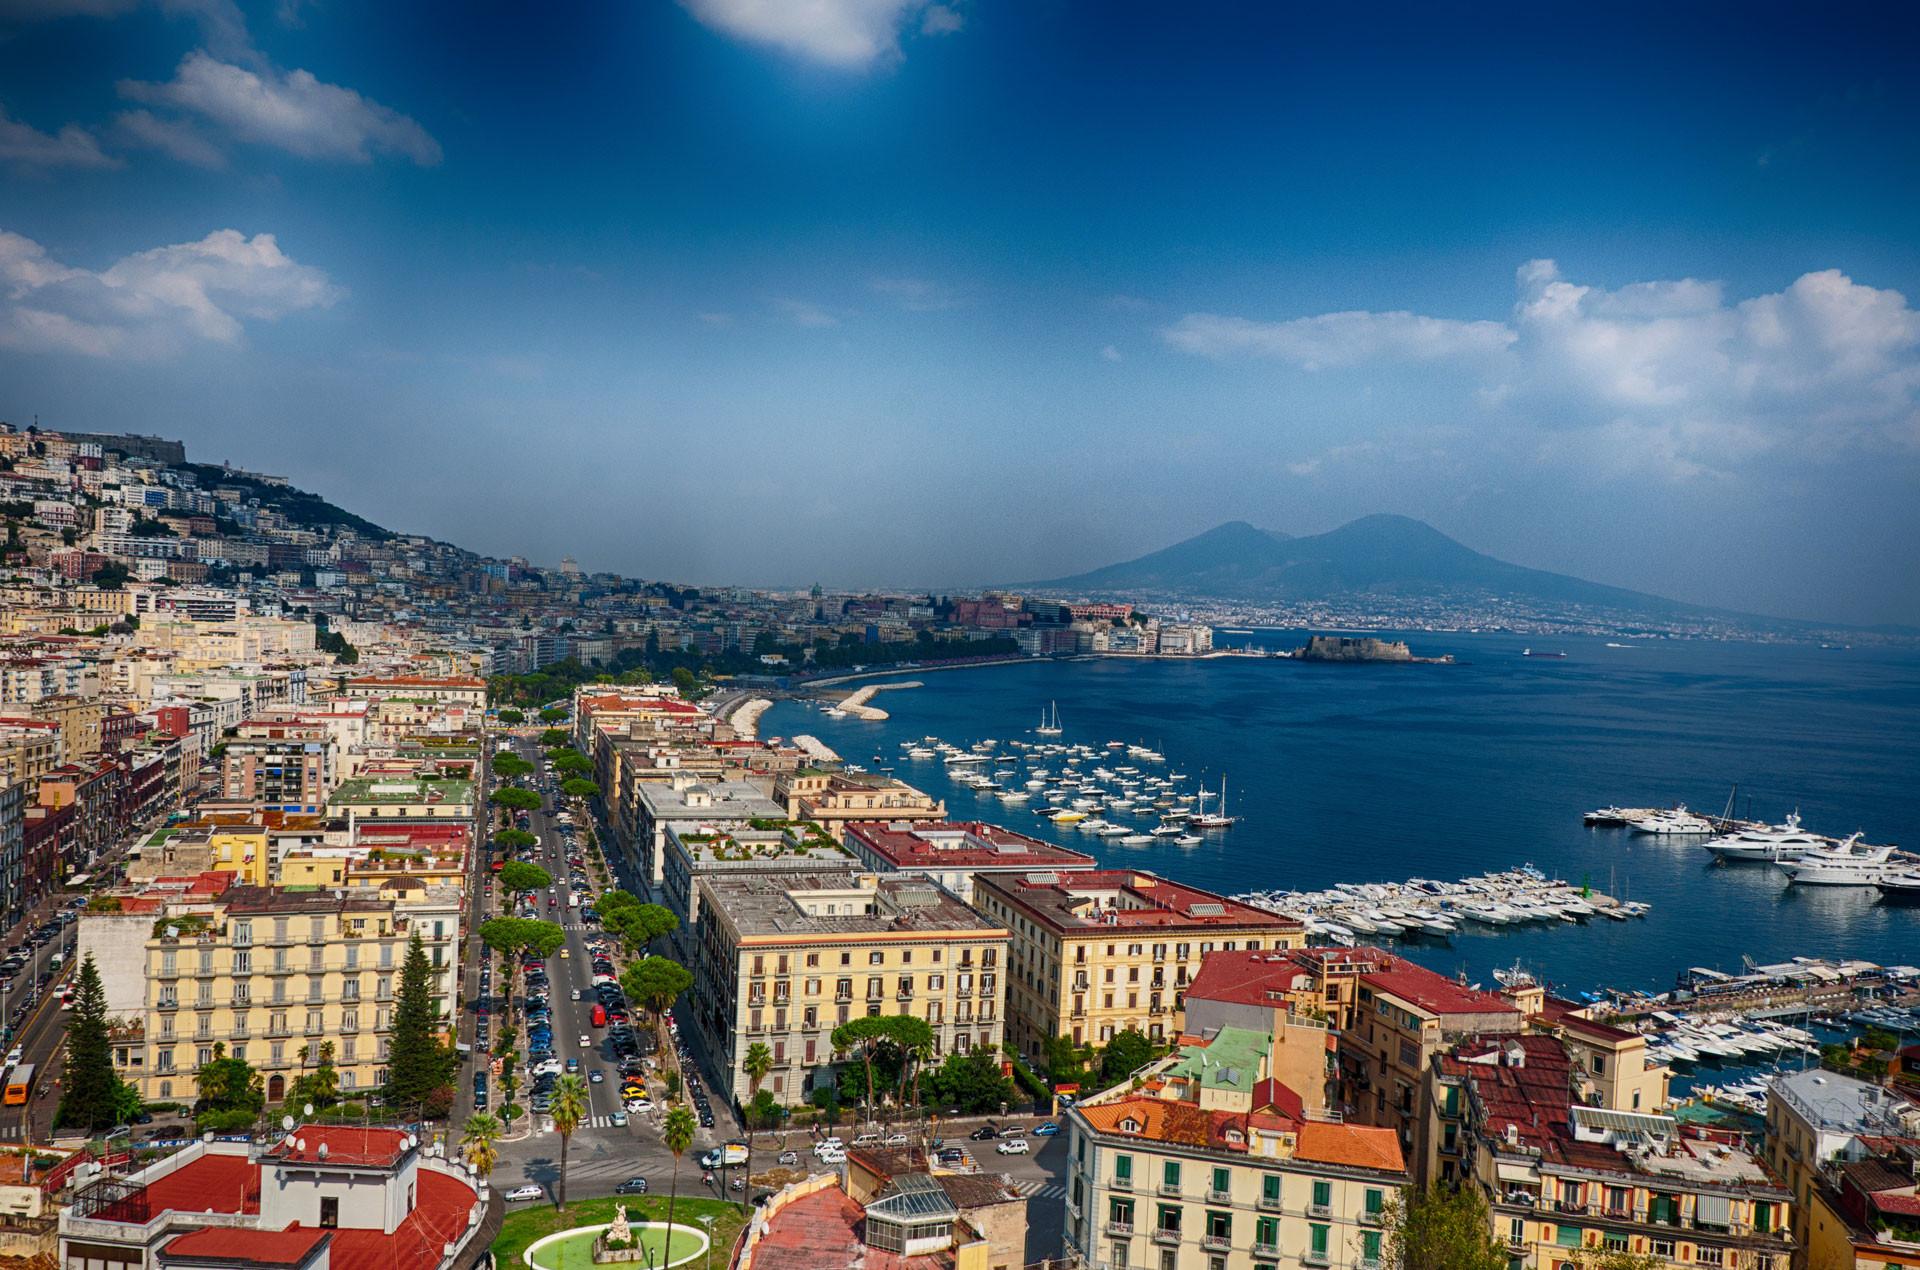 Wallpaper Naples Florida: Sfondi Napoli (71+ Immagini